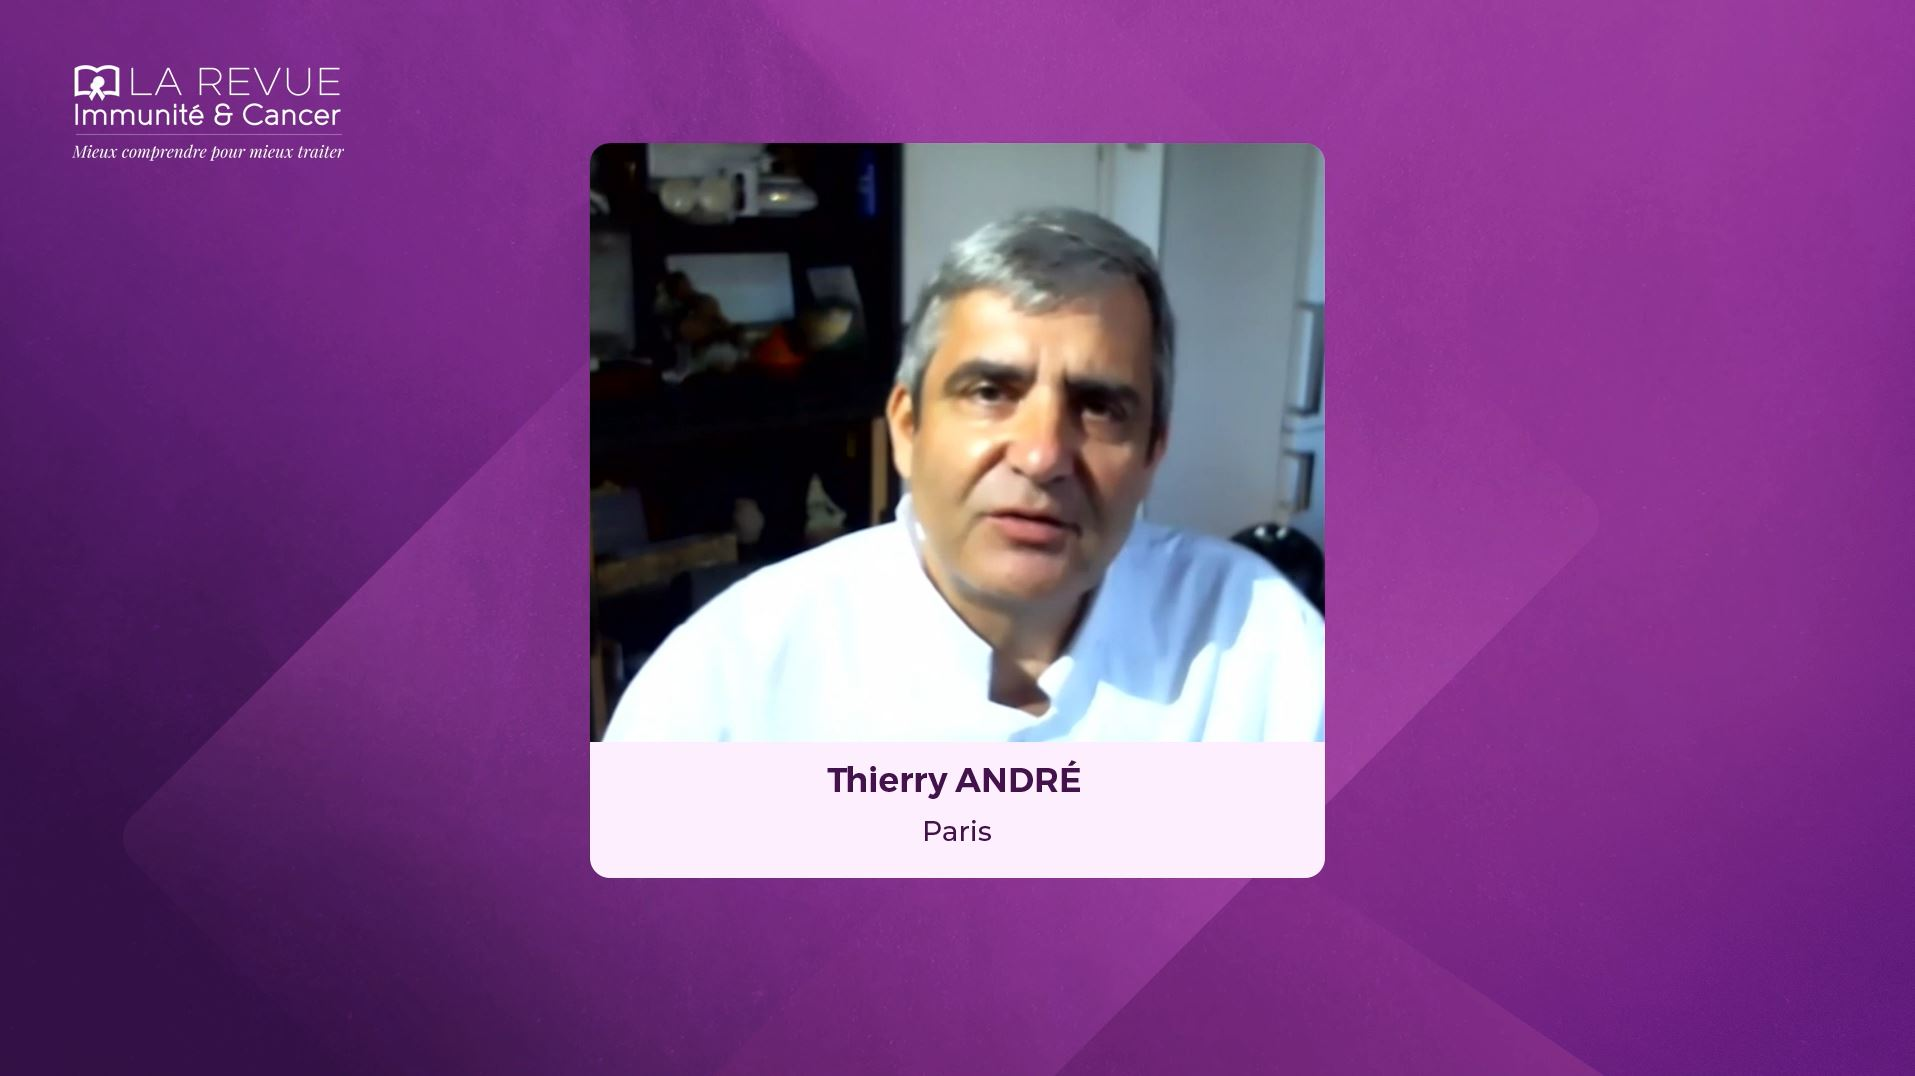 Thierry ANDRE, Paris